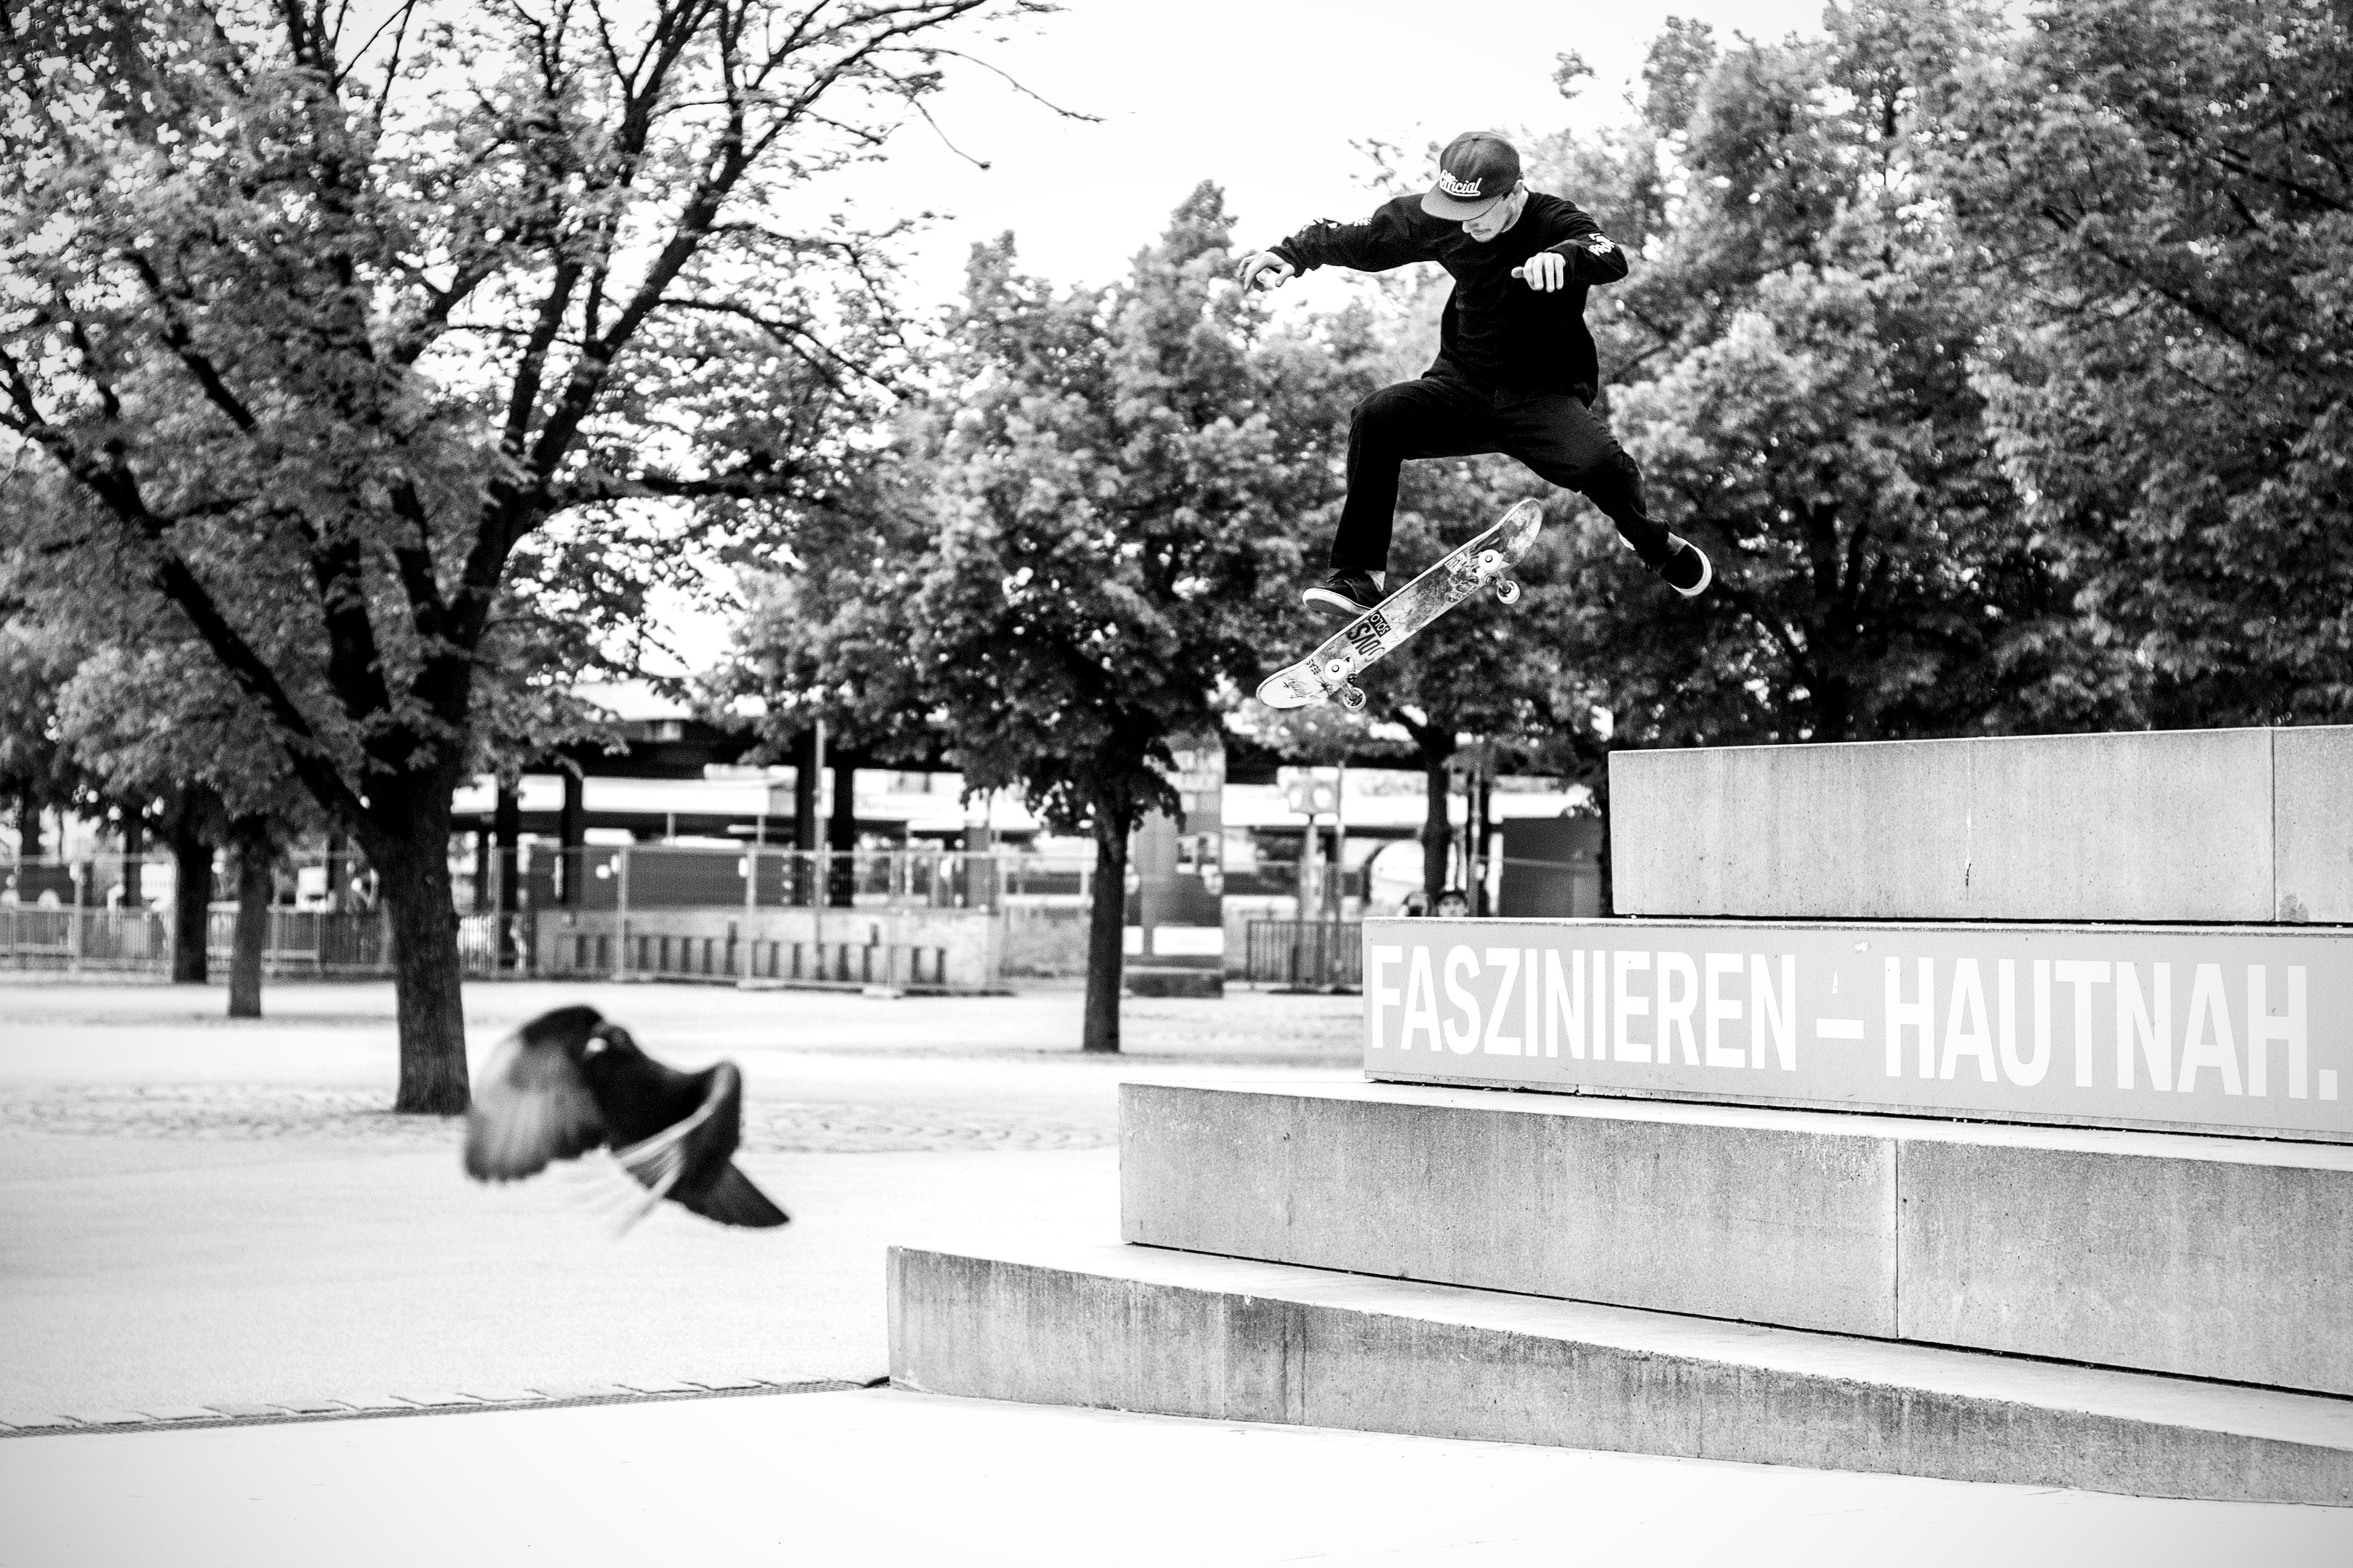 Favorite Skateboard Comany presents DAGGERS_Daniel Trautwein_Sw No Comply